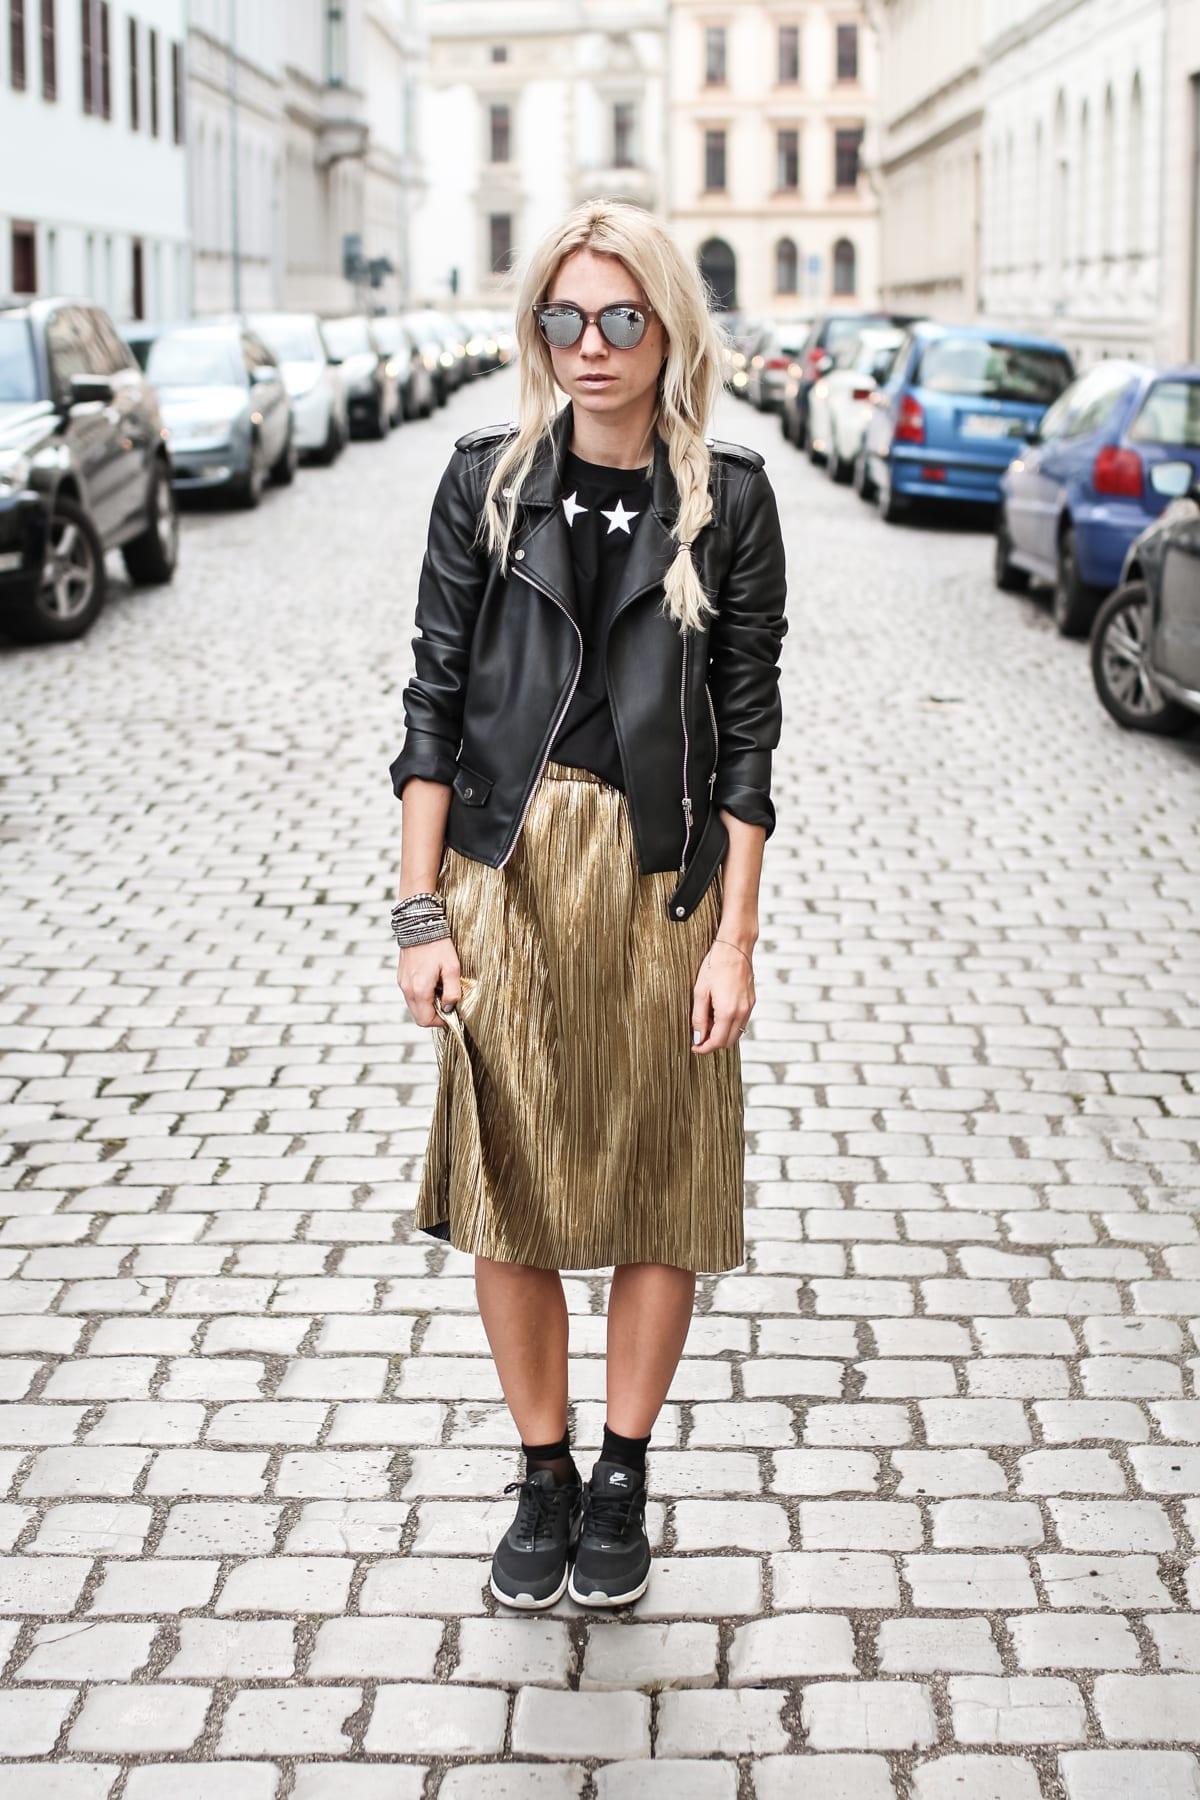 CK_1603_Metalic-Street-Style-Fashion_-9517